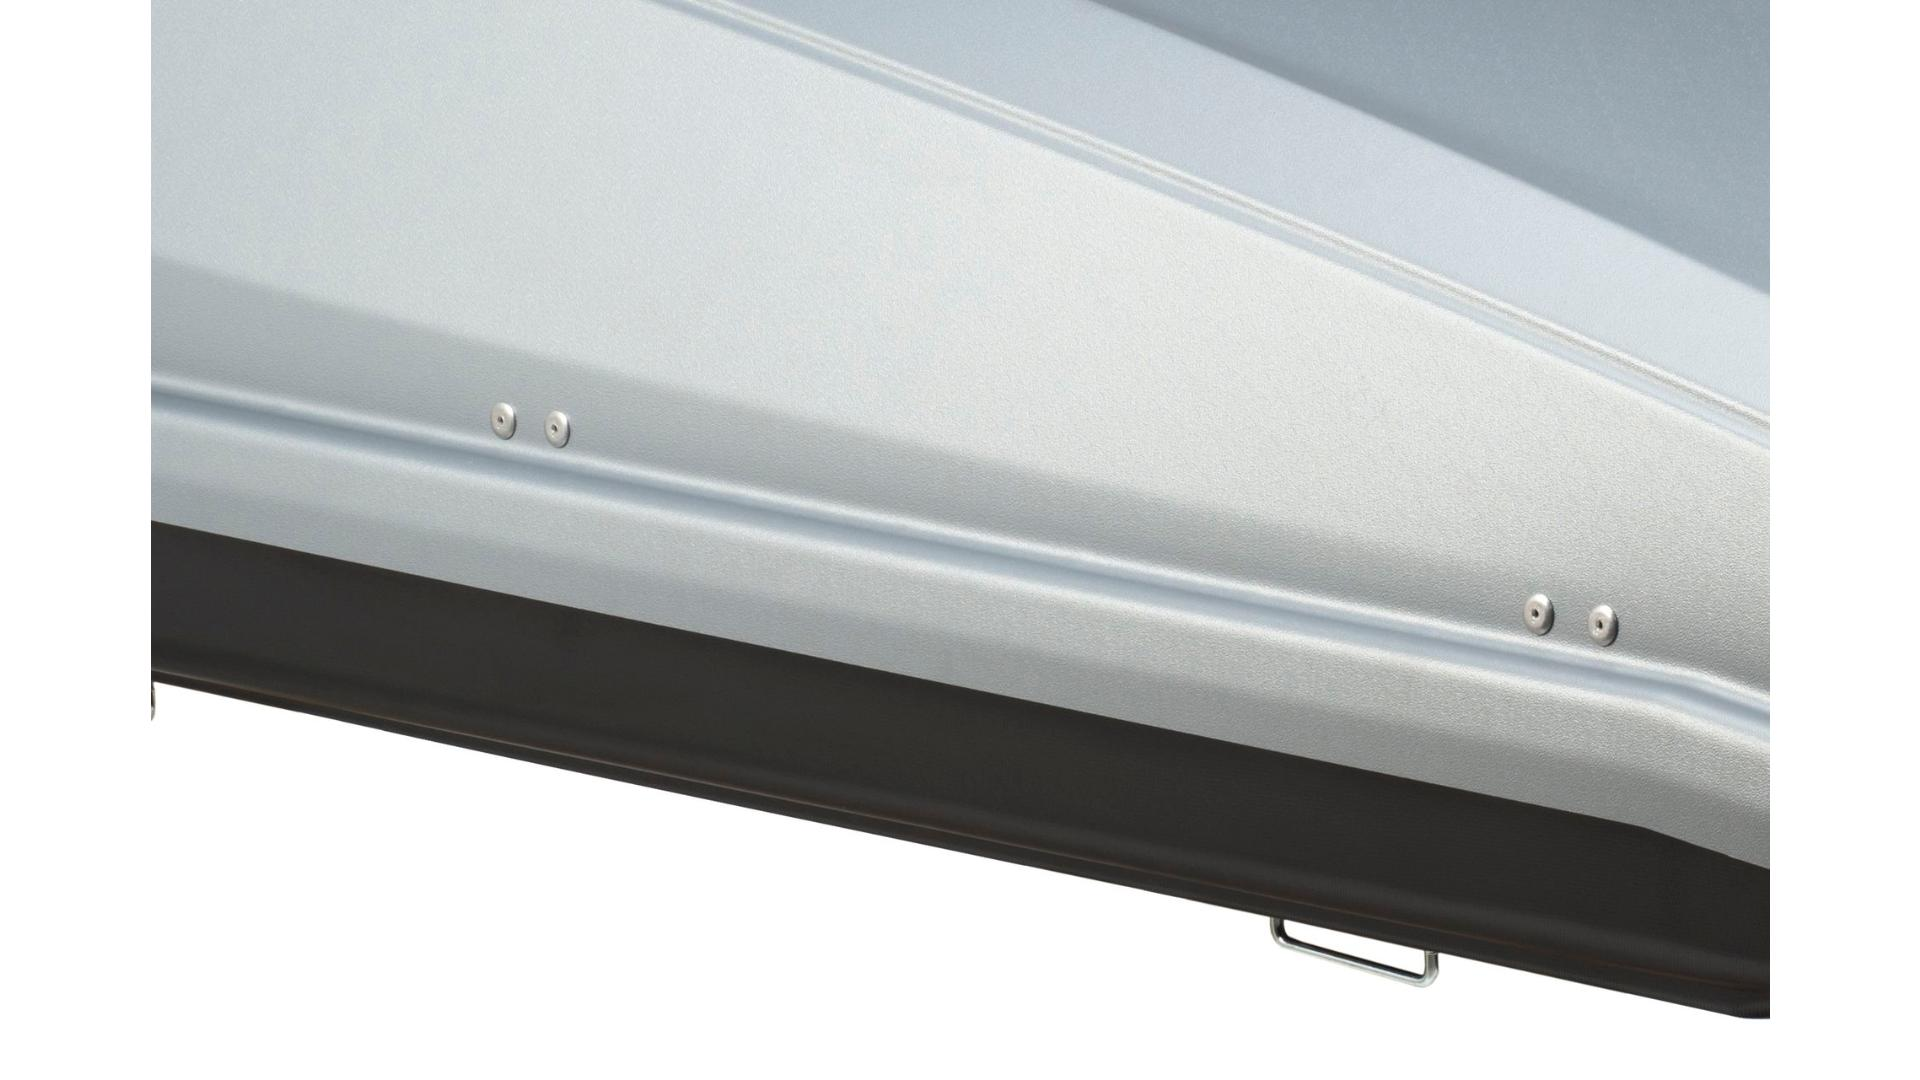 Taurus střešní box Easy 430 (180x78x40) 430 l.- šedý matný